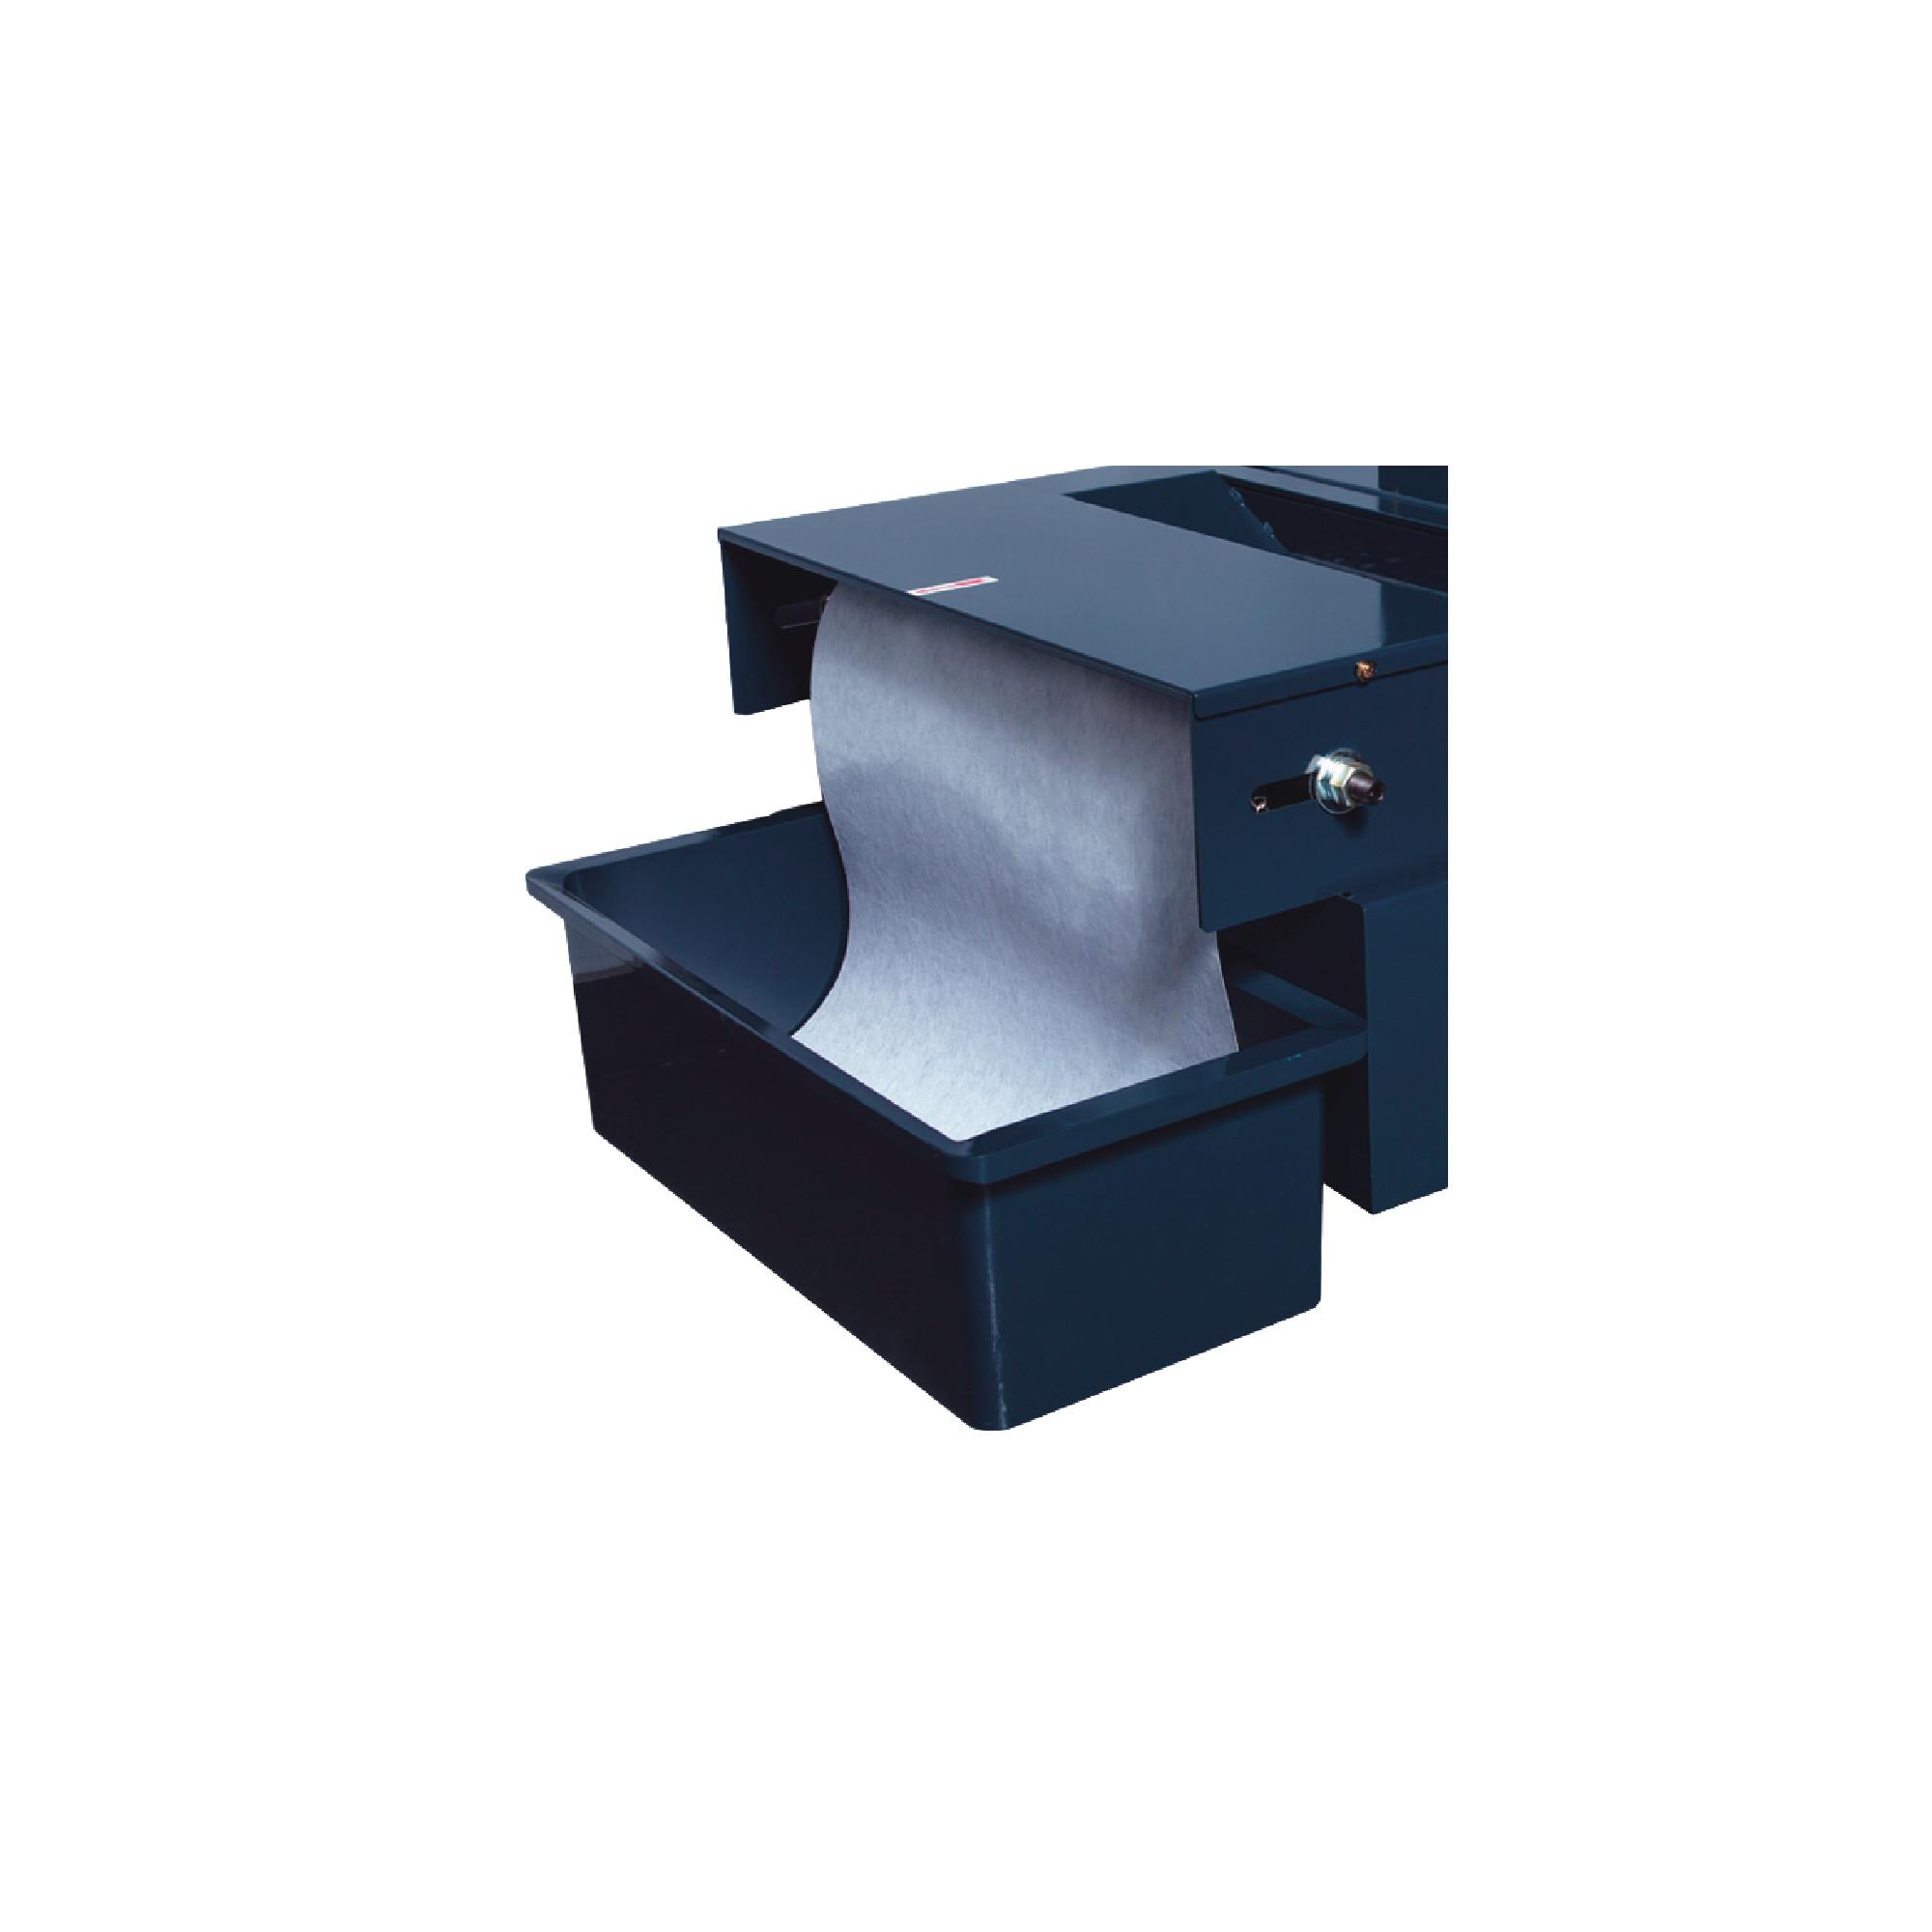 120/160 Media Bed Filter Paper